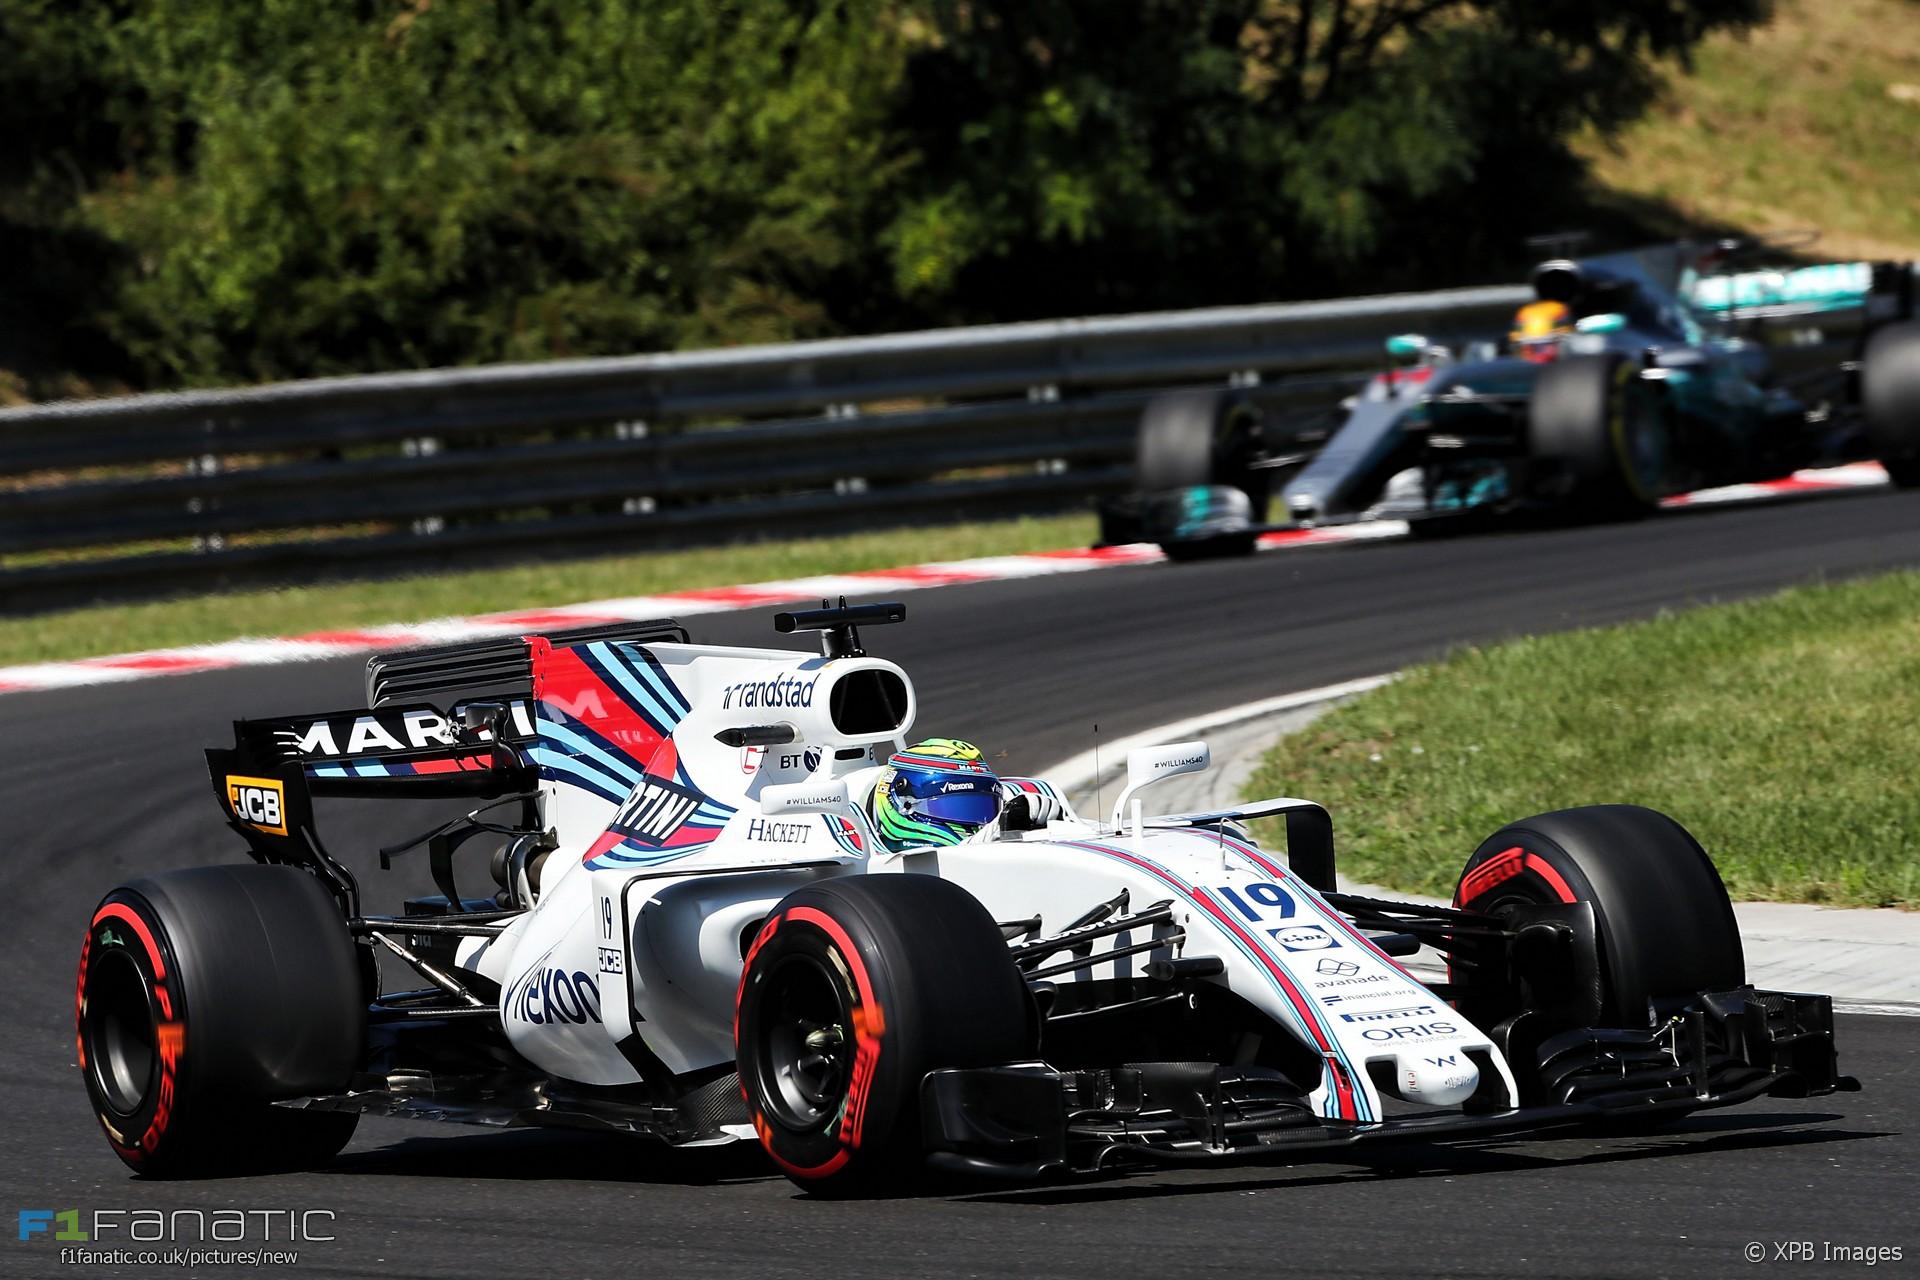 Felipe Massa, Williams, Hungaroring, 2017